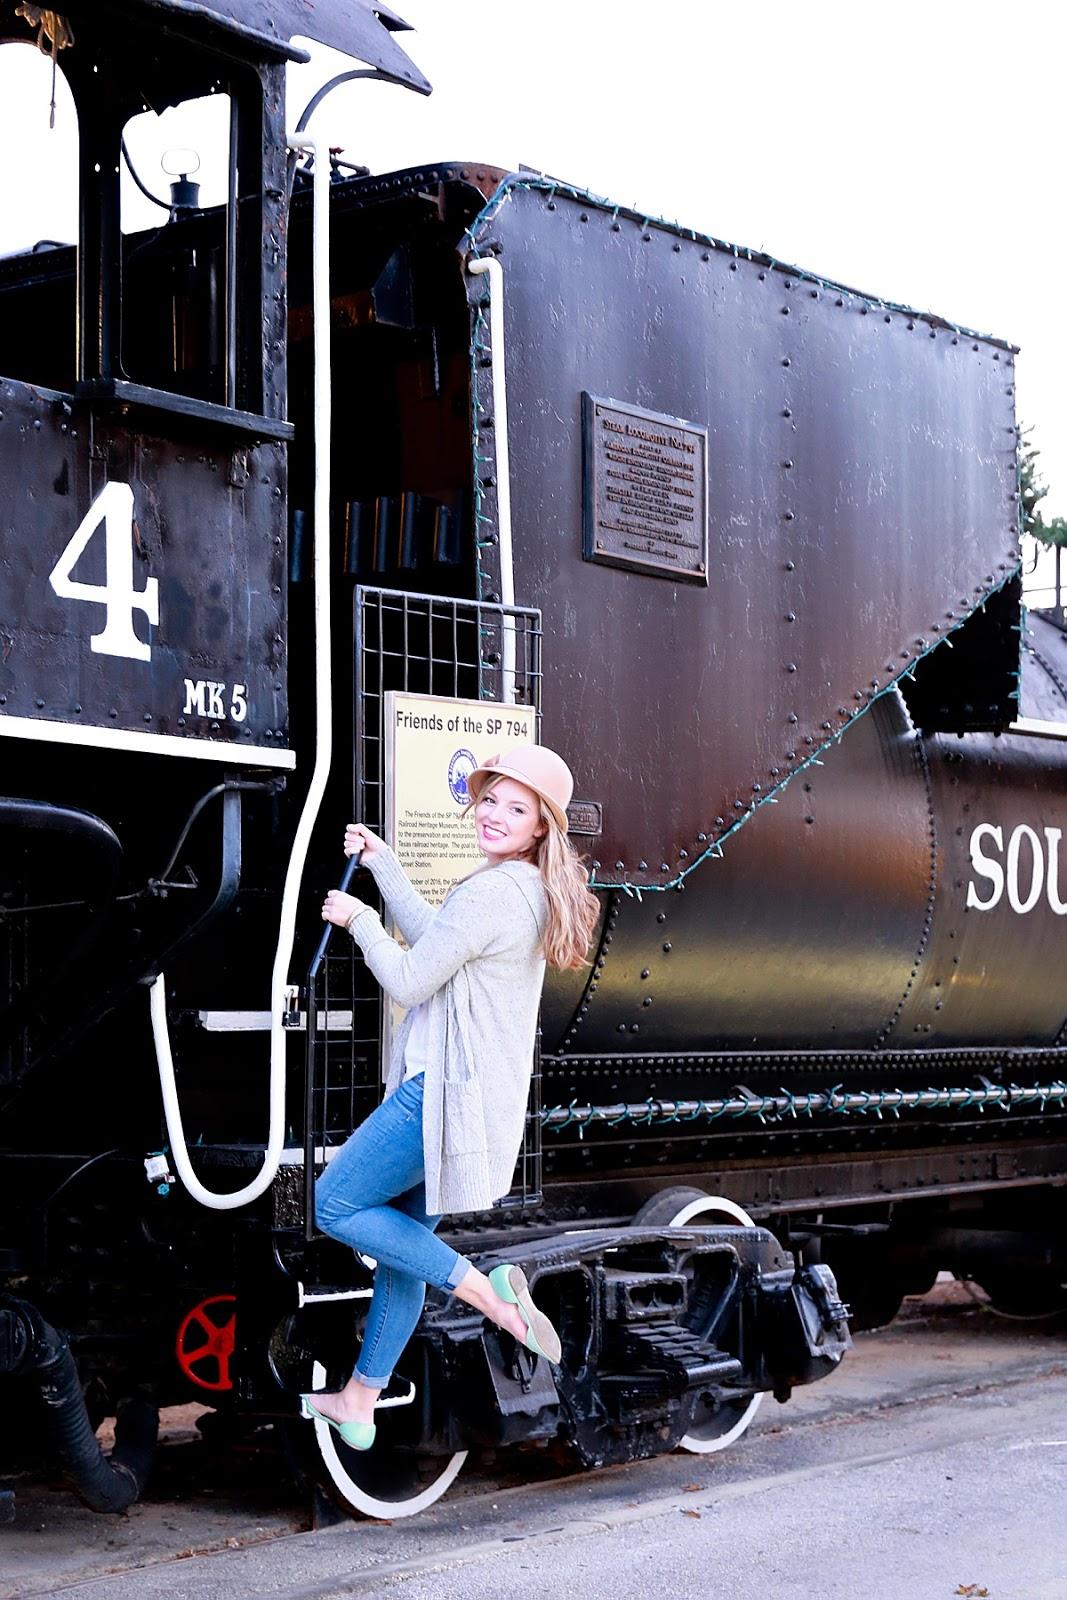 Sunset Station San Antonio Senior Session, San Antonio Senior Photographer